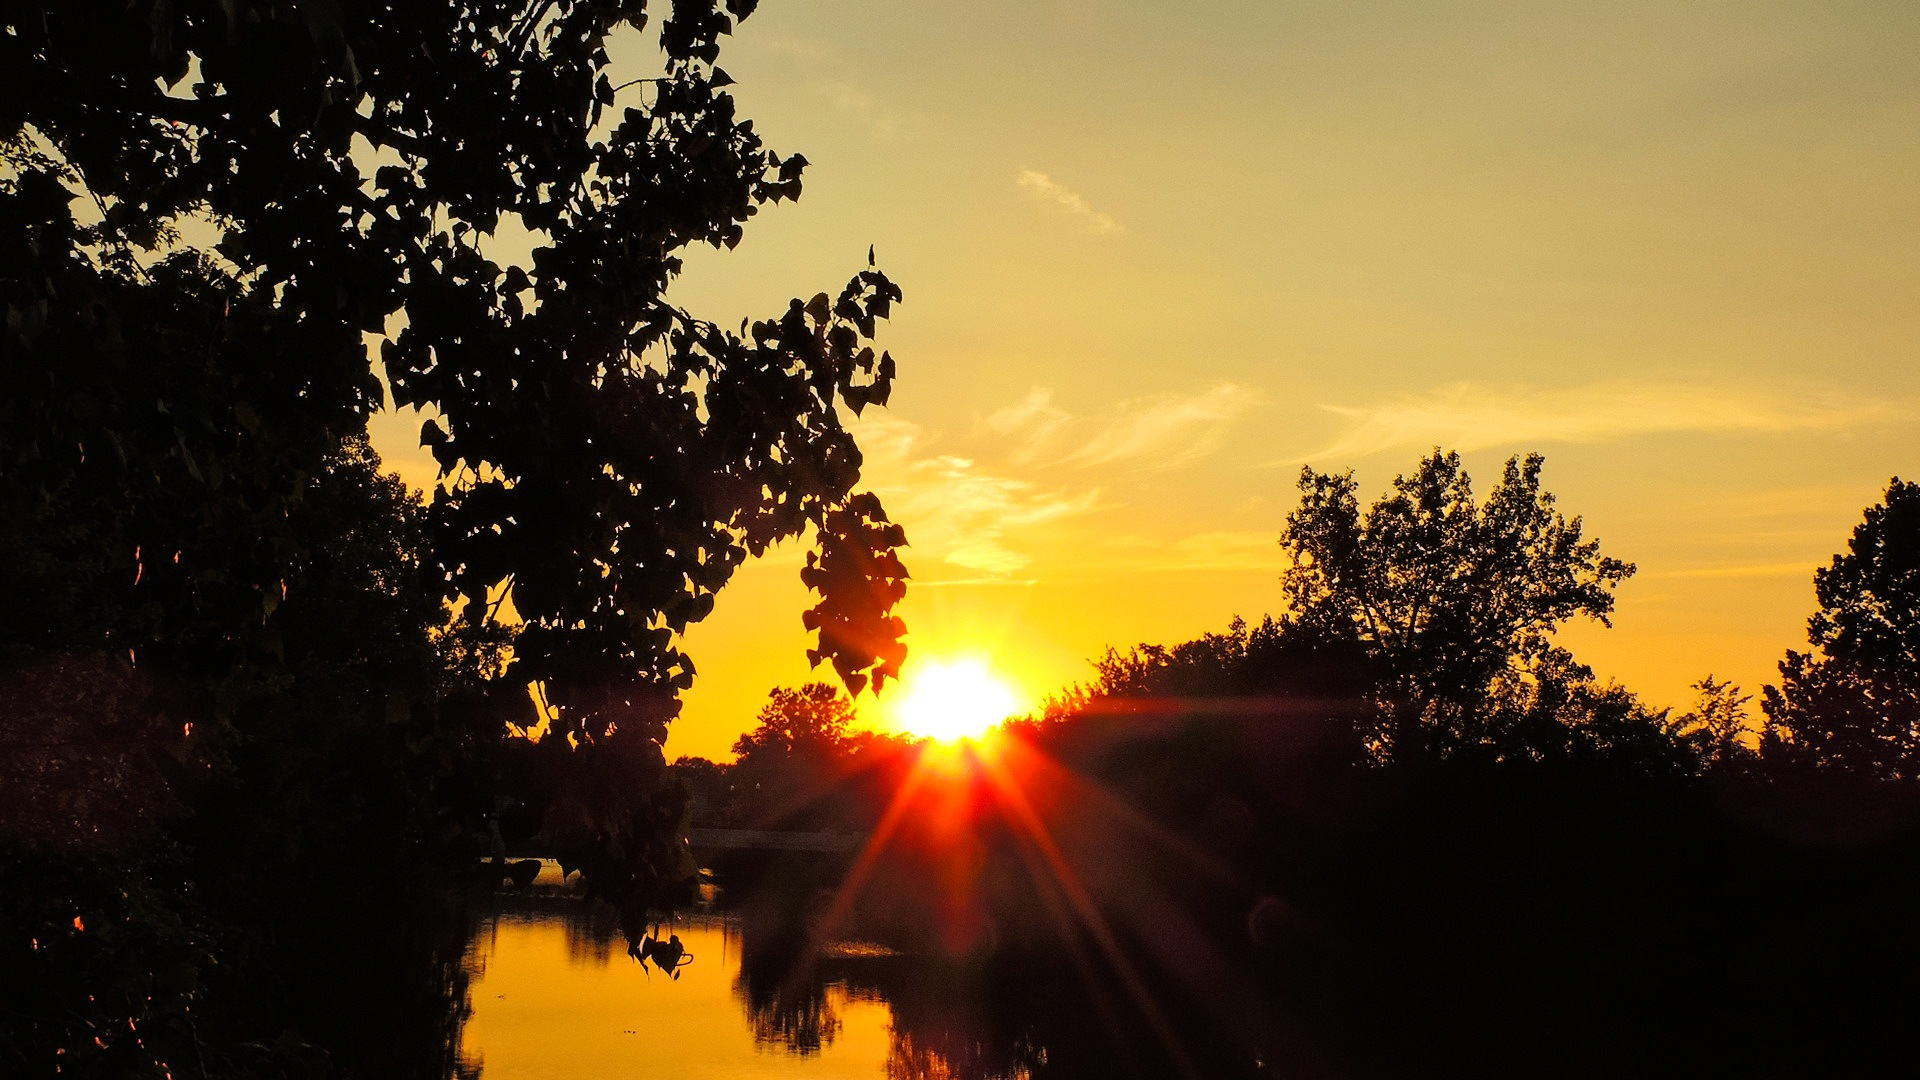 Golden Sunset by Jim Martin